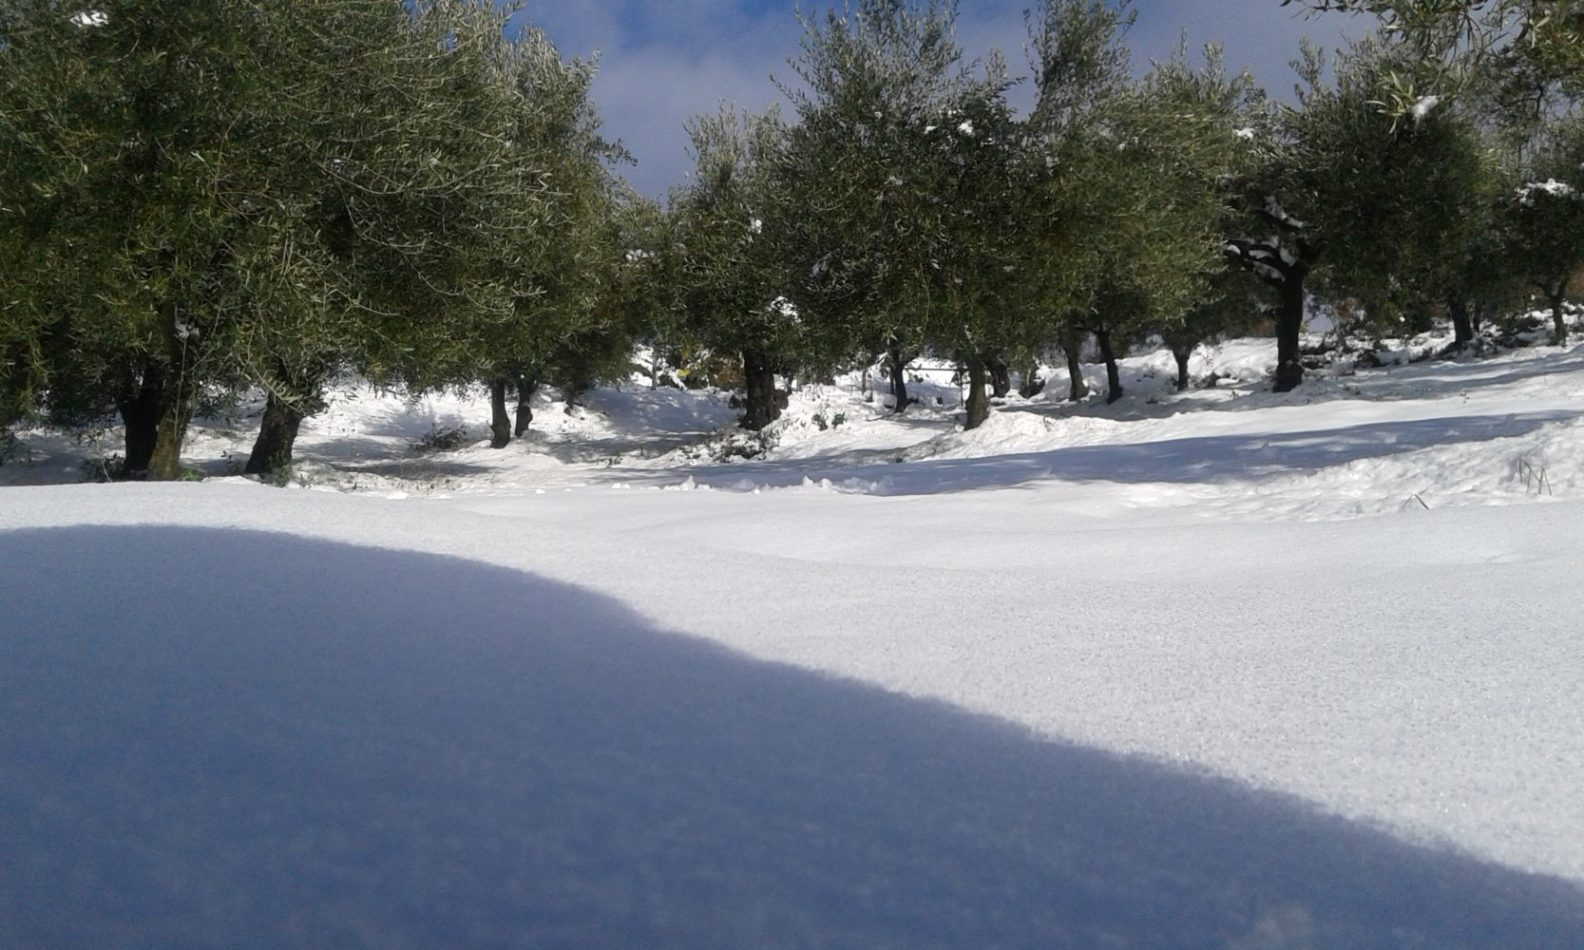 Arriva la neve.